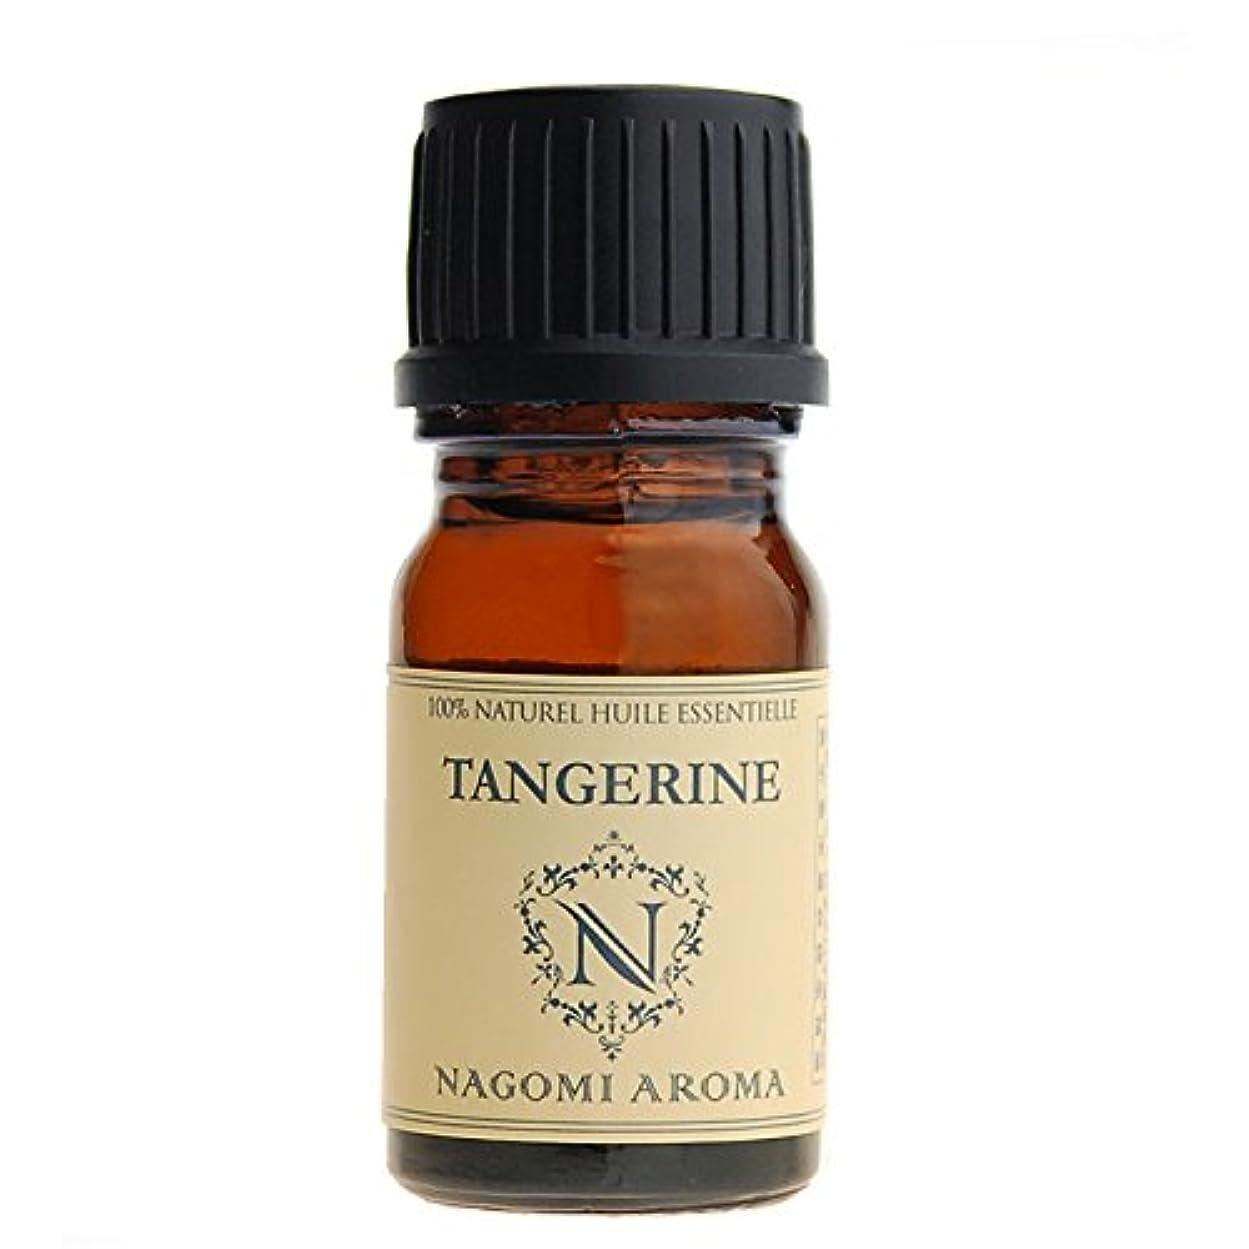 【AEAJ認定表示基準認定精油】NAGOMI PURE タンジェリン 5ml 【エッセンシャルオイル】【精油】【アロマオイル】|CONVOILs